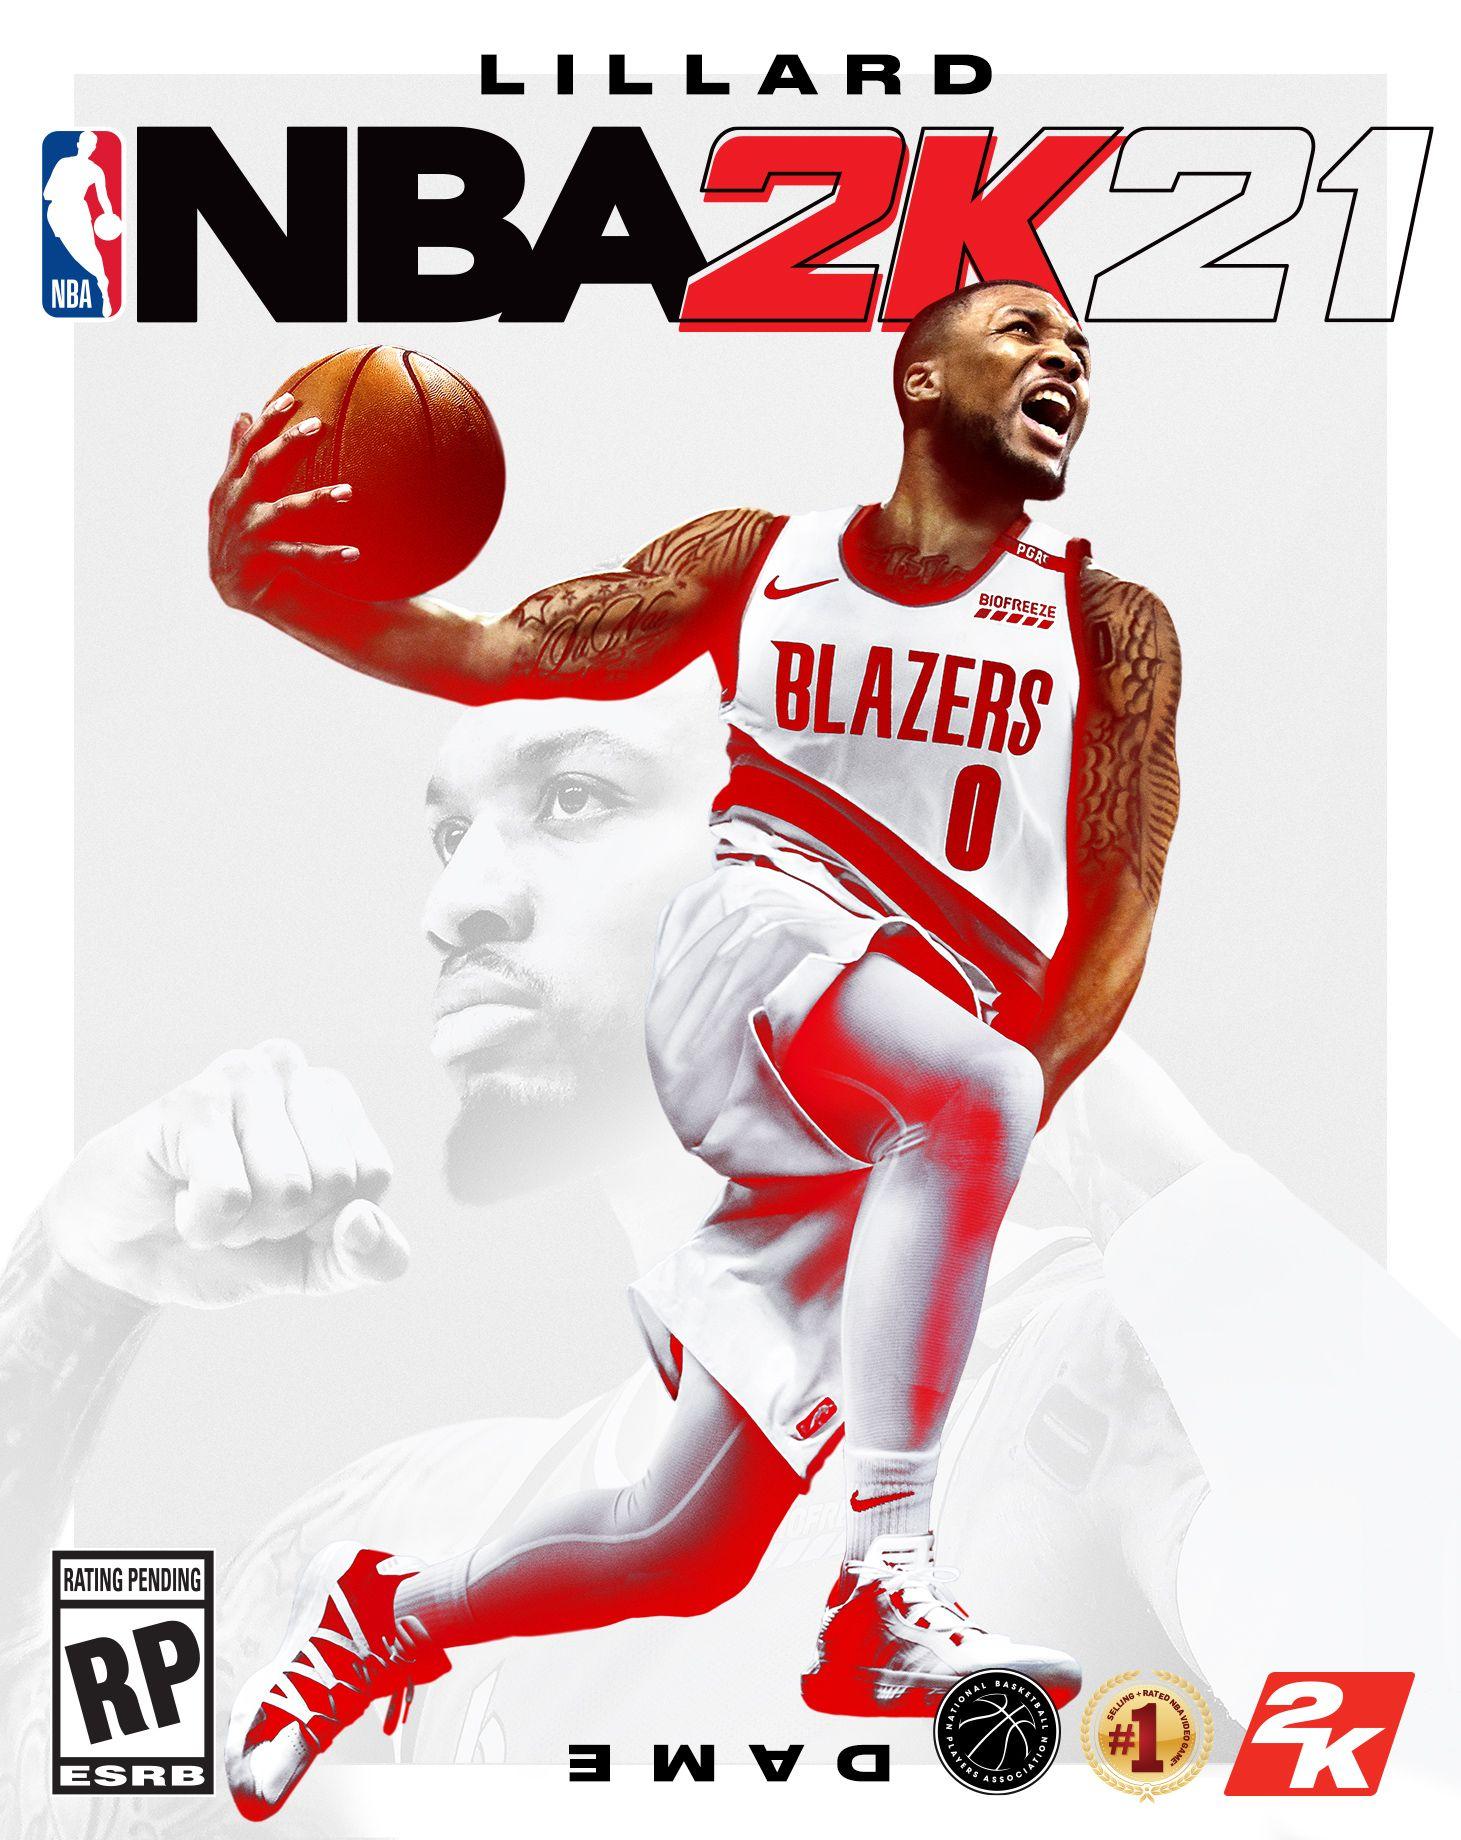 NBA 2K21 Reveals Damian Lillard As First Cover Star